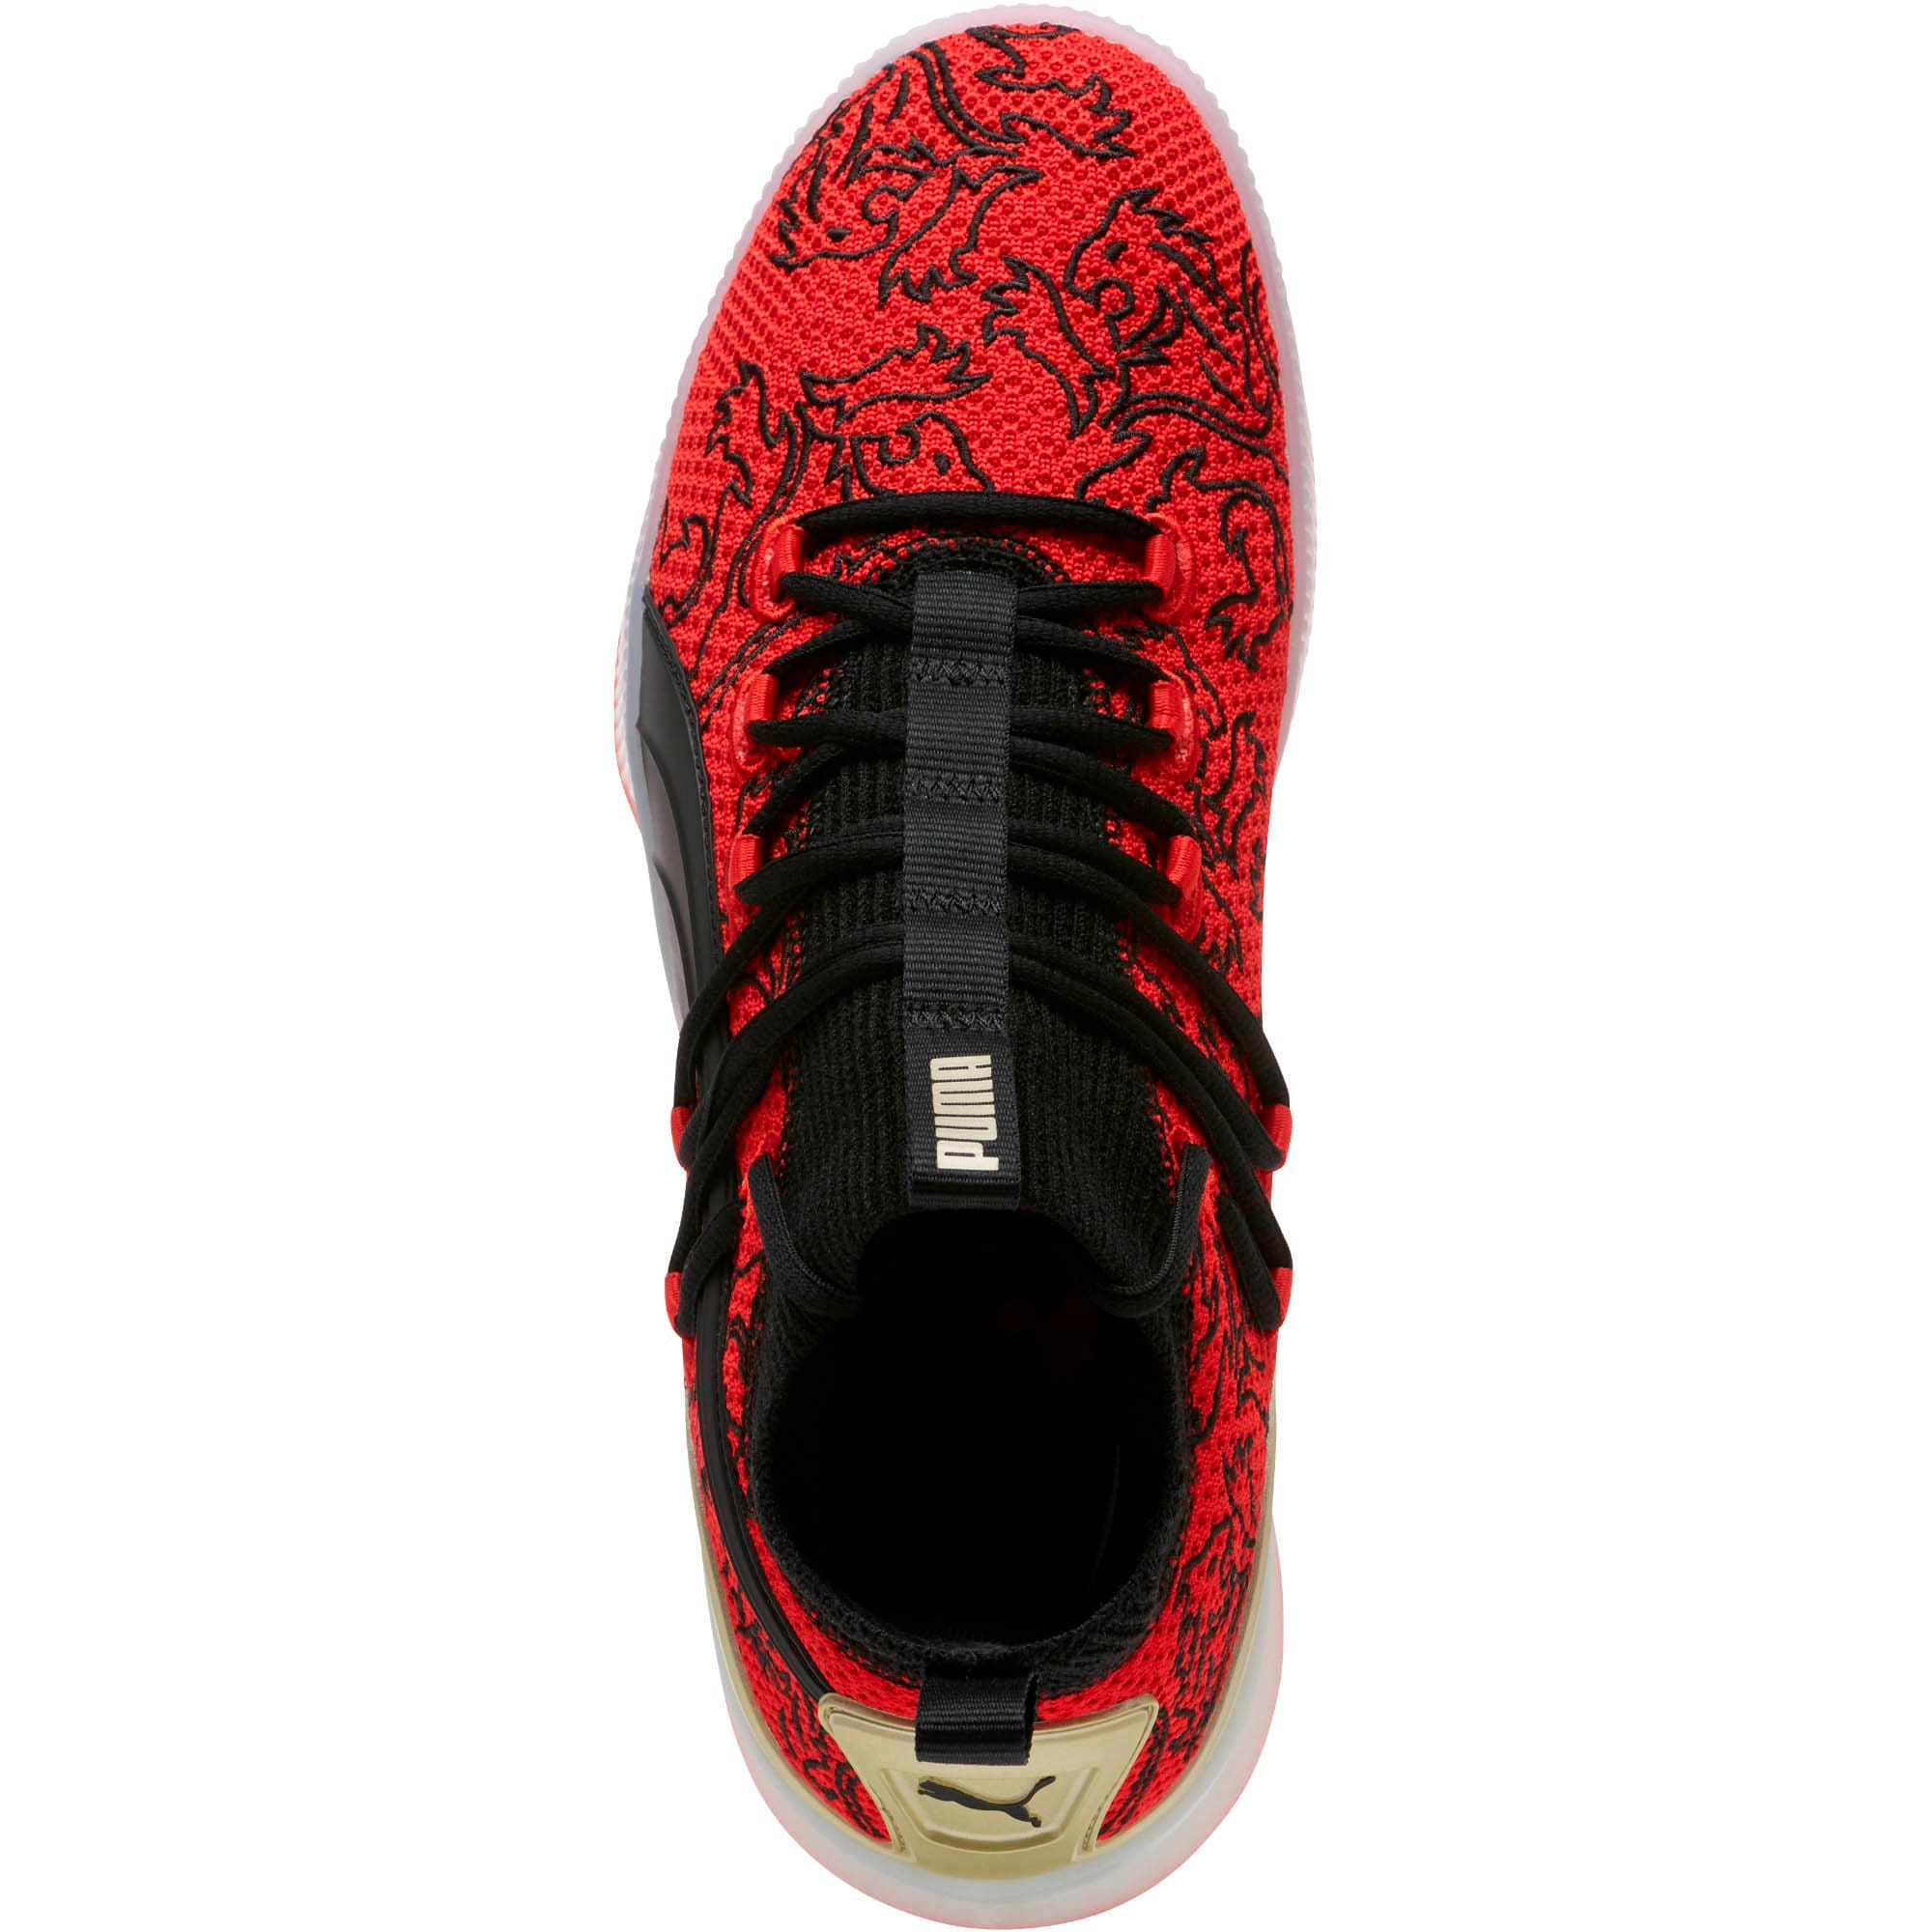 Thumbnail 5 of Clyde Court London Men's Basketball Shoes, High Risk Red-Puma Black, medium